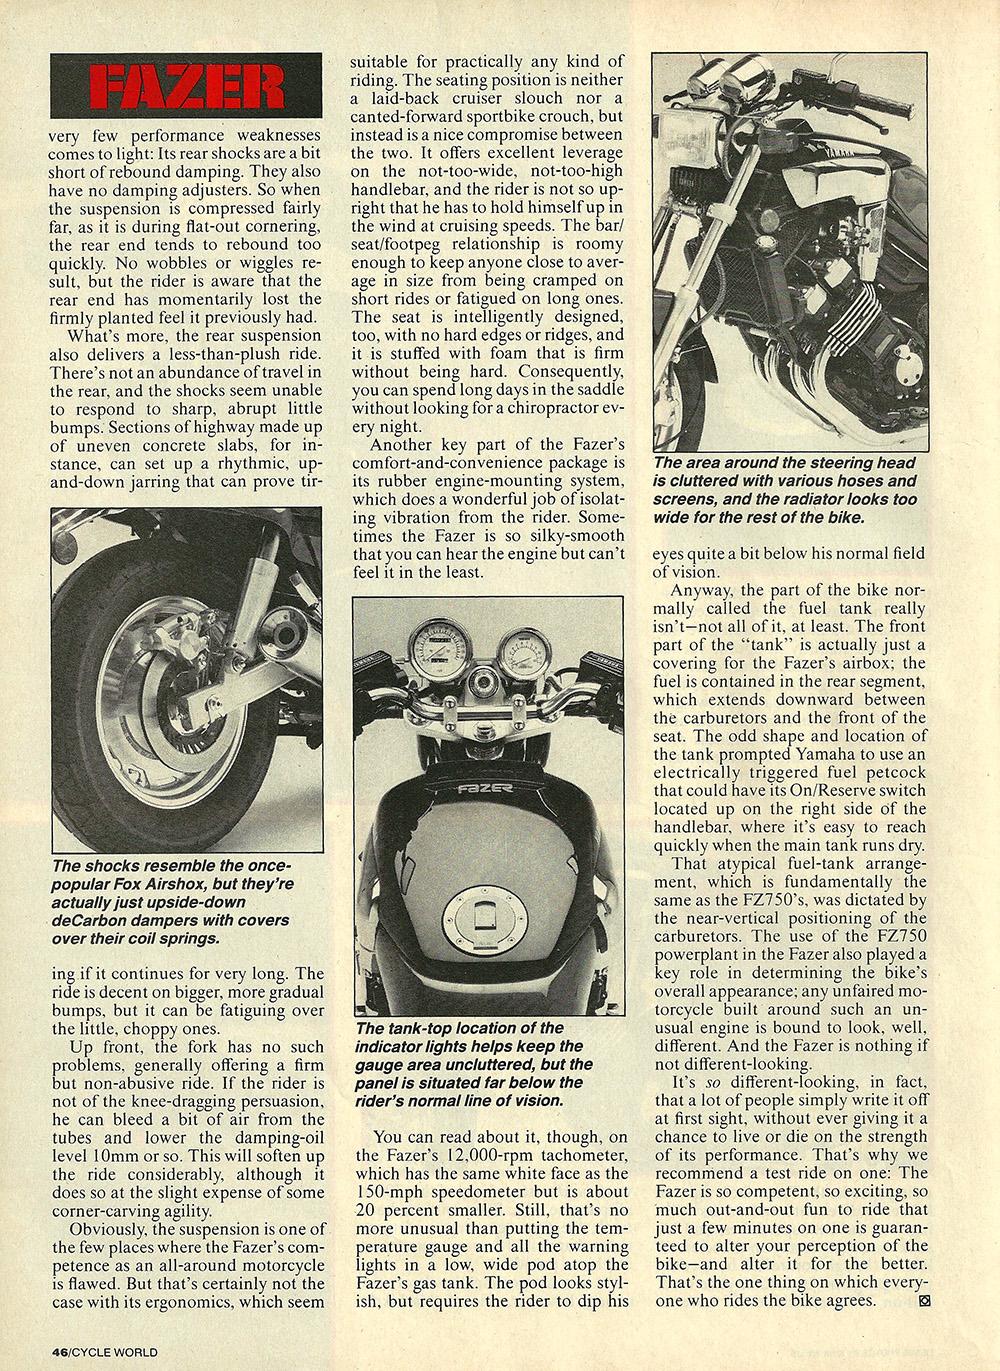 1986 Yamaha Fazer FZX700 road test 05.jpg